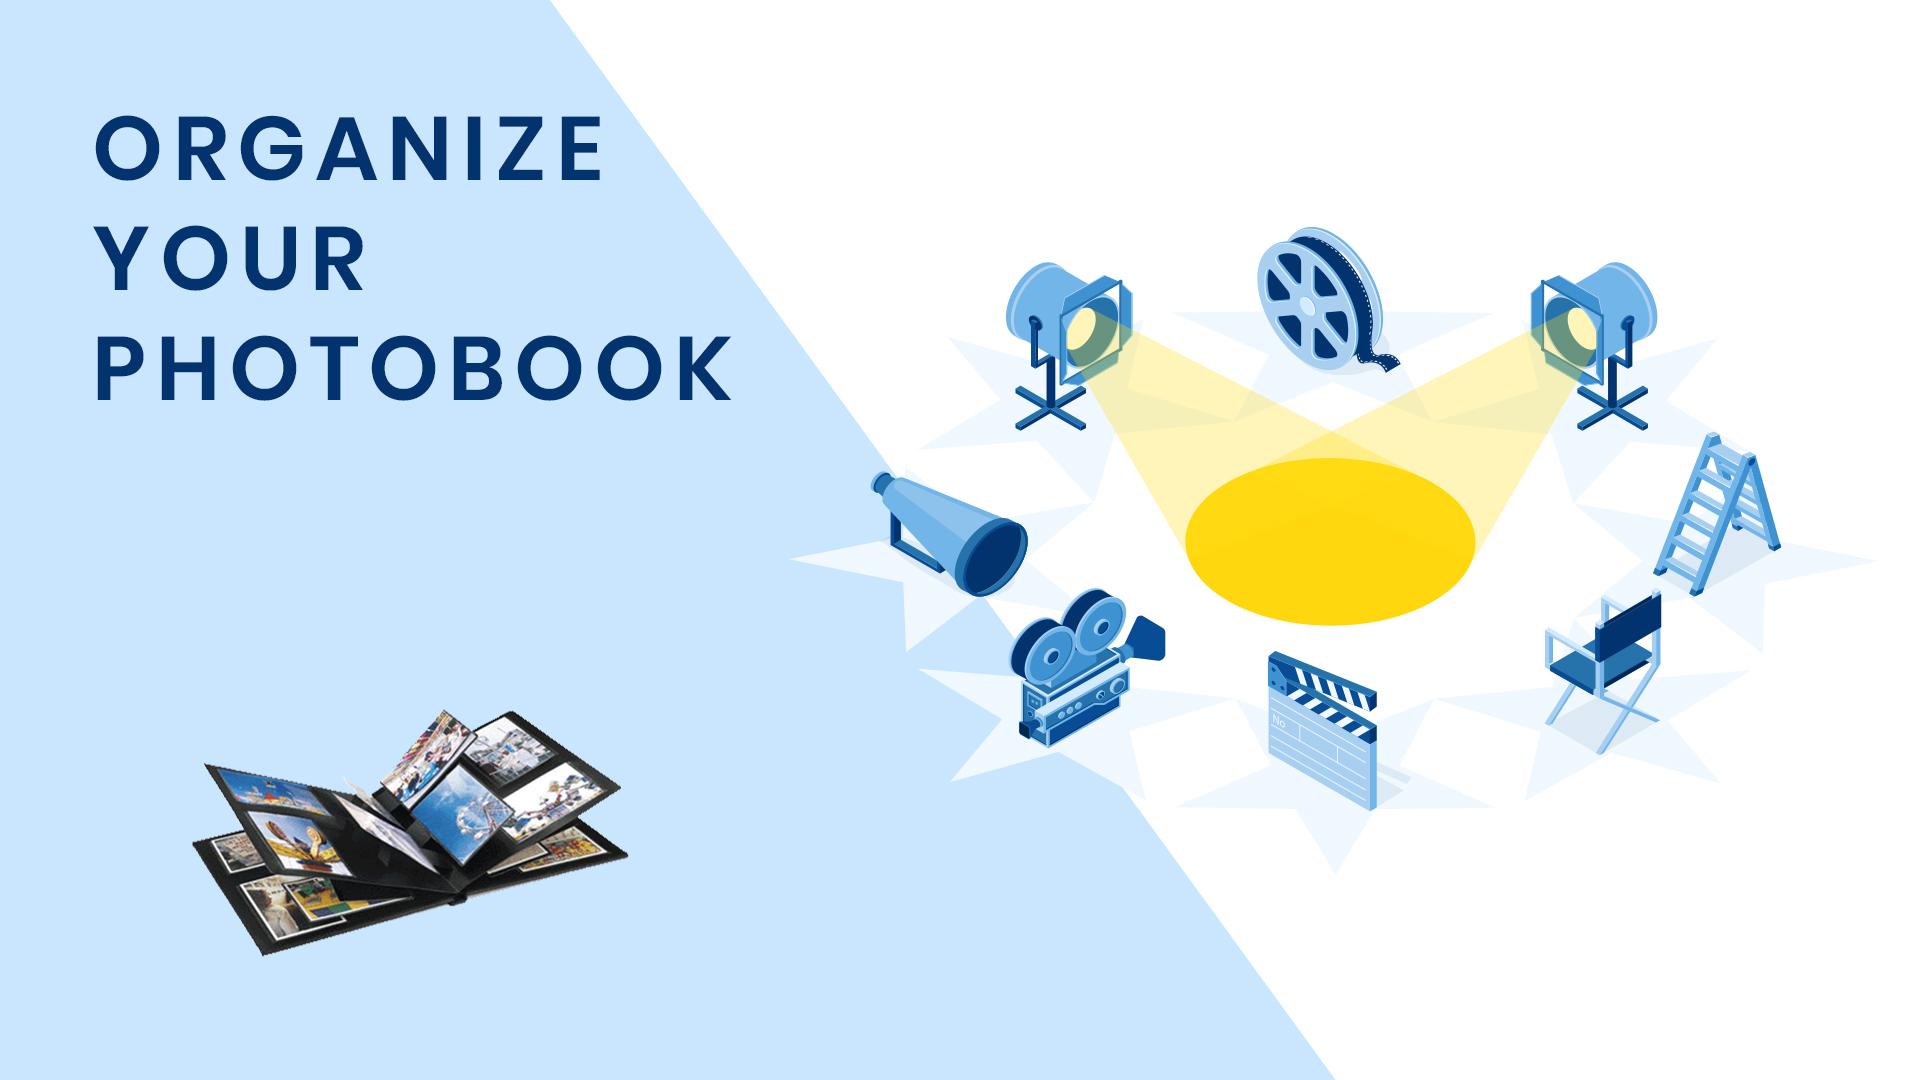 Top Creative Ways To Organize Your Photobook